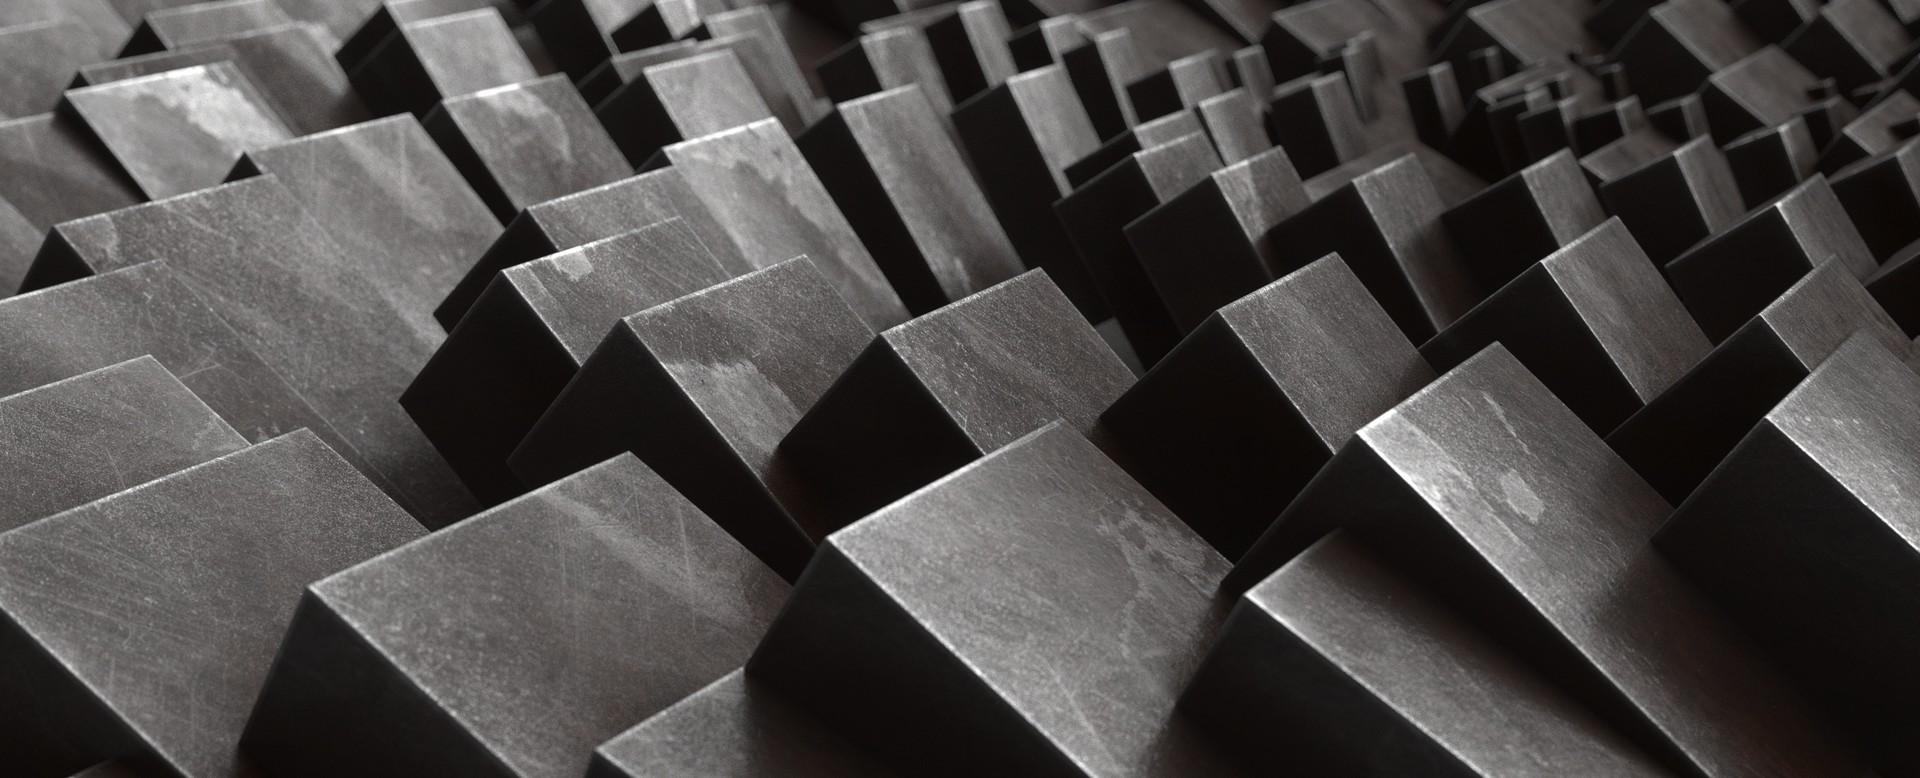 Kresimir jelusic robob3ar 494 abstract box 23